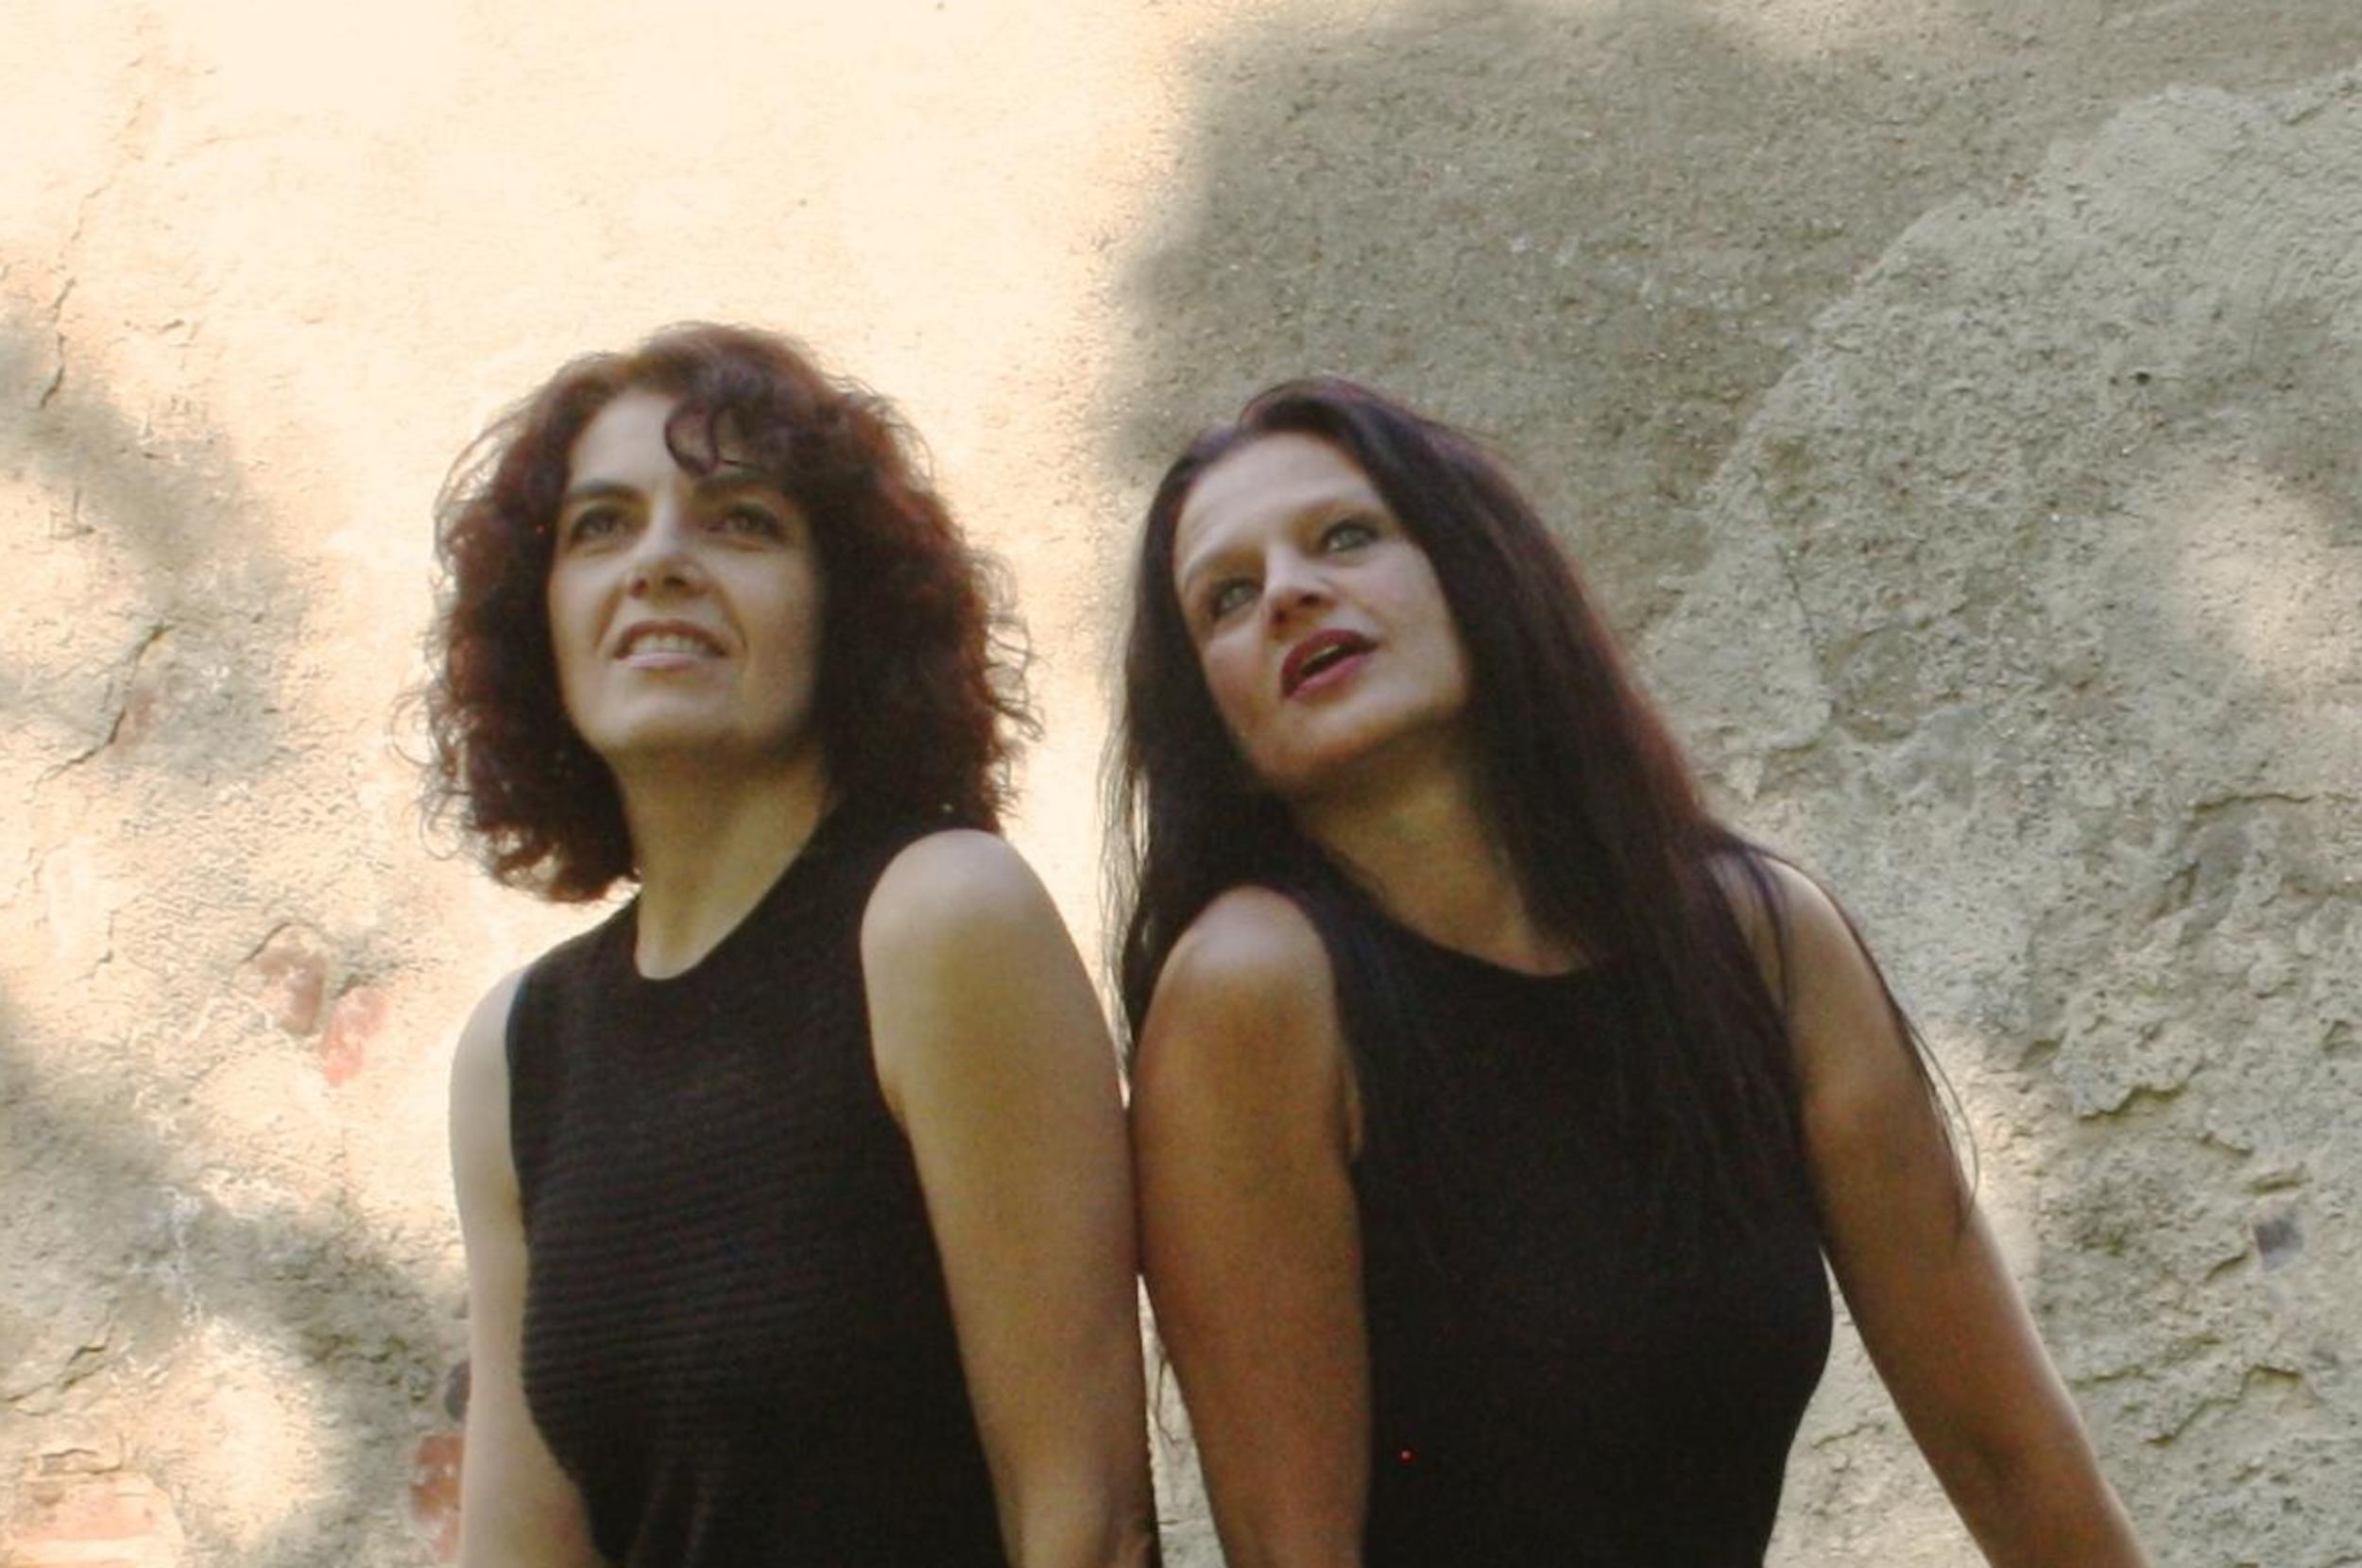 Duo_sistere_karina_gitte_kugel_kopie